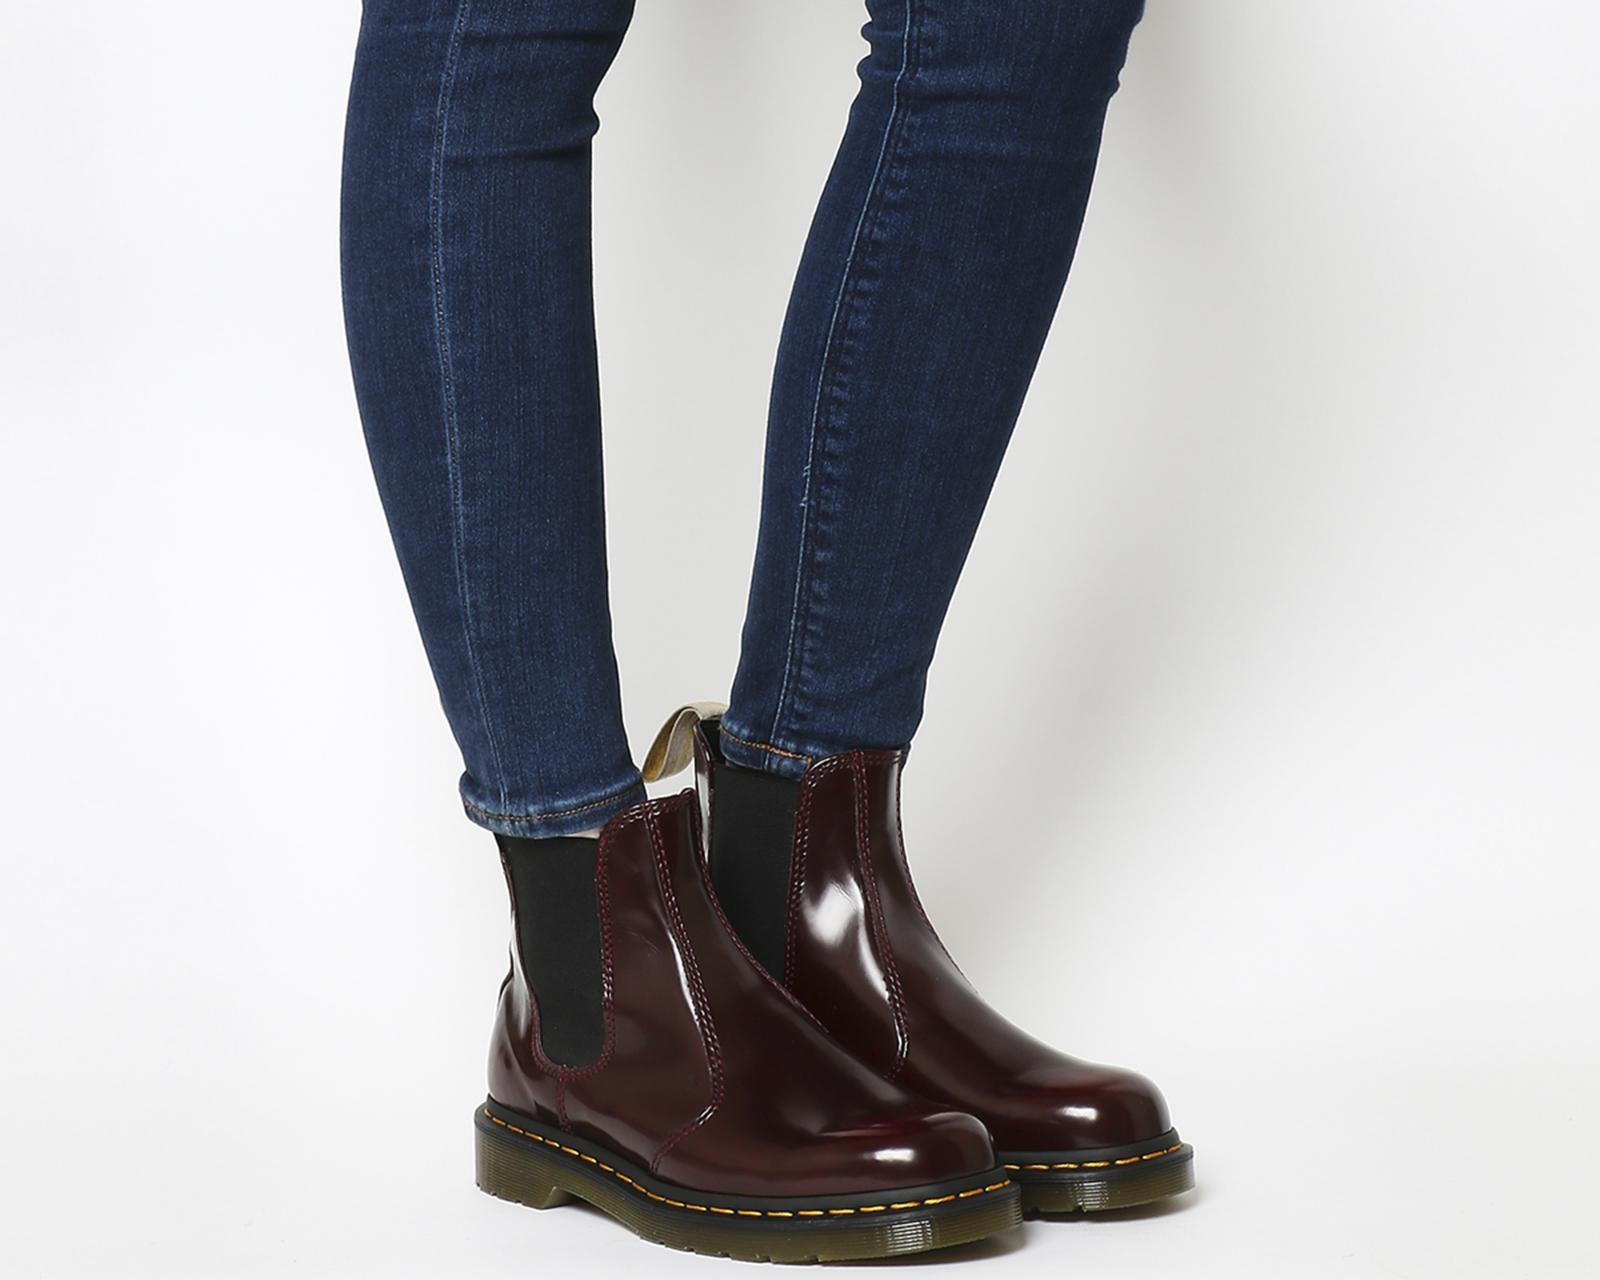 7c5cce24 SENTINEL Womens Dr. Martens Vegan 2976 CHERRY Chelsea Boots Stivali